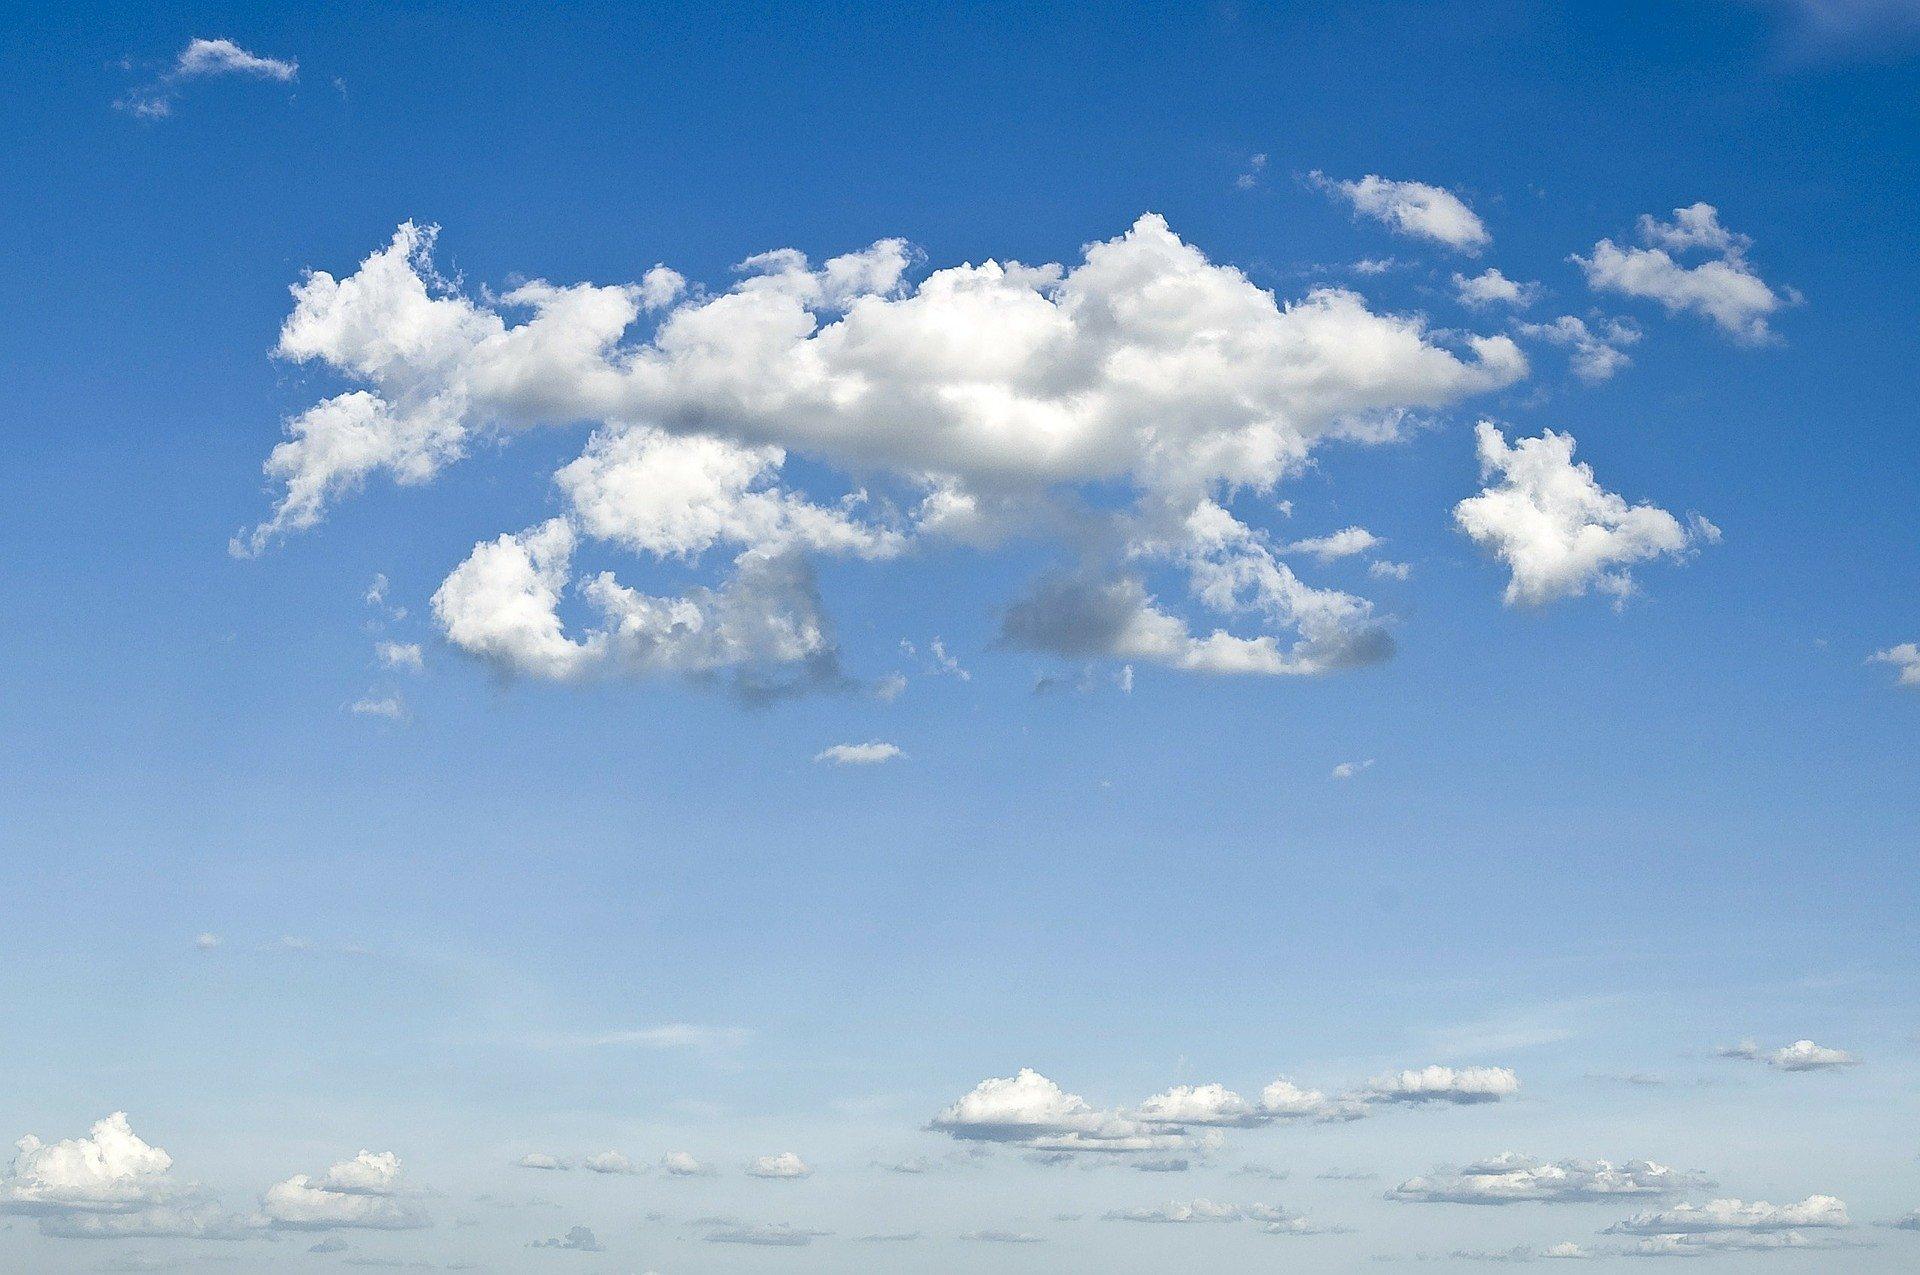 Niebo wolne od smogu